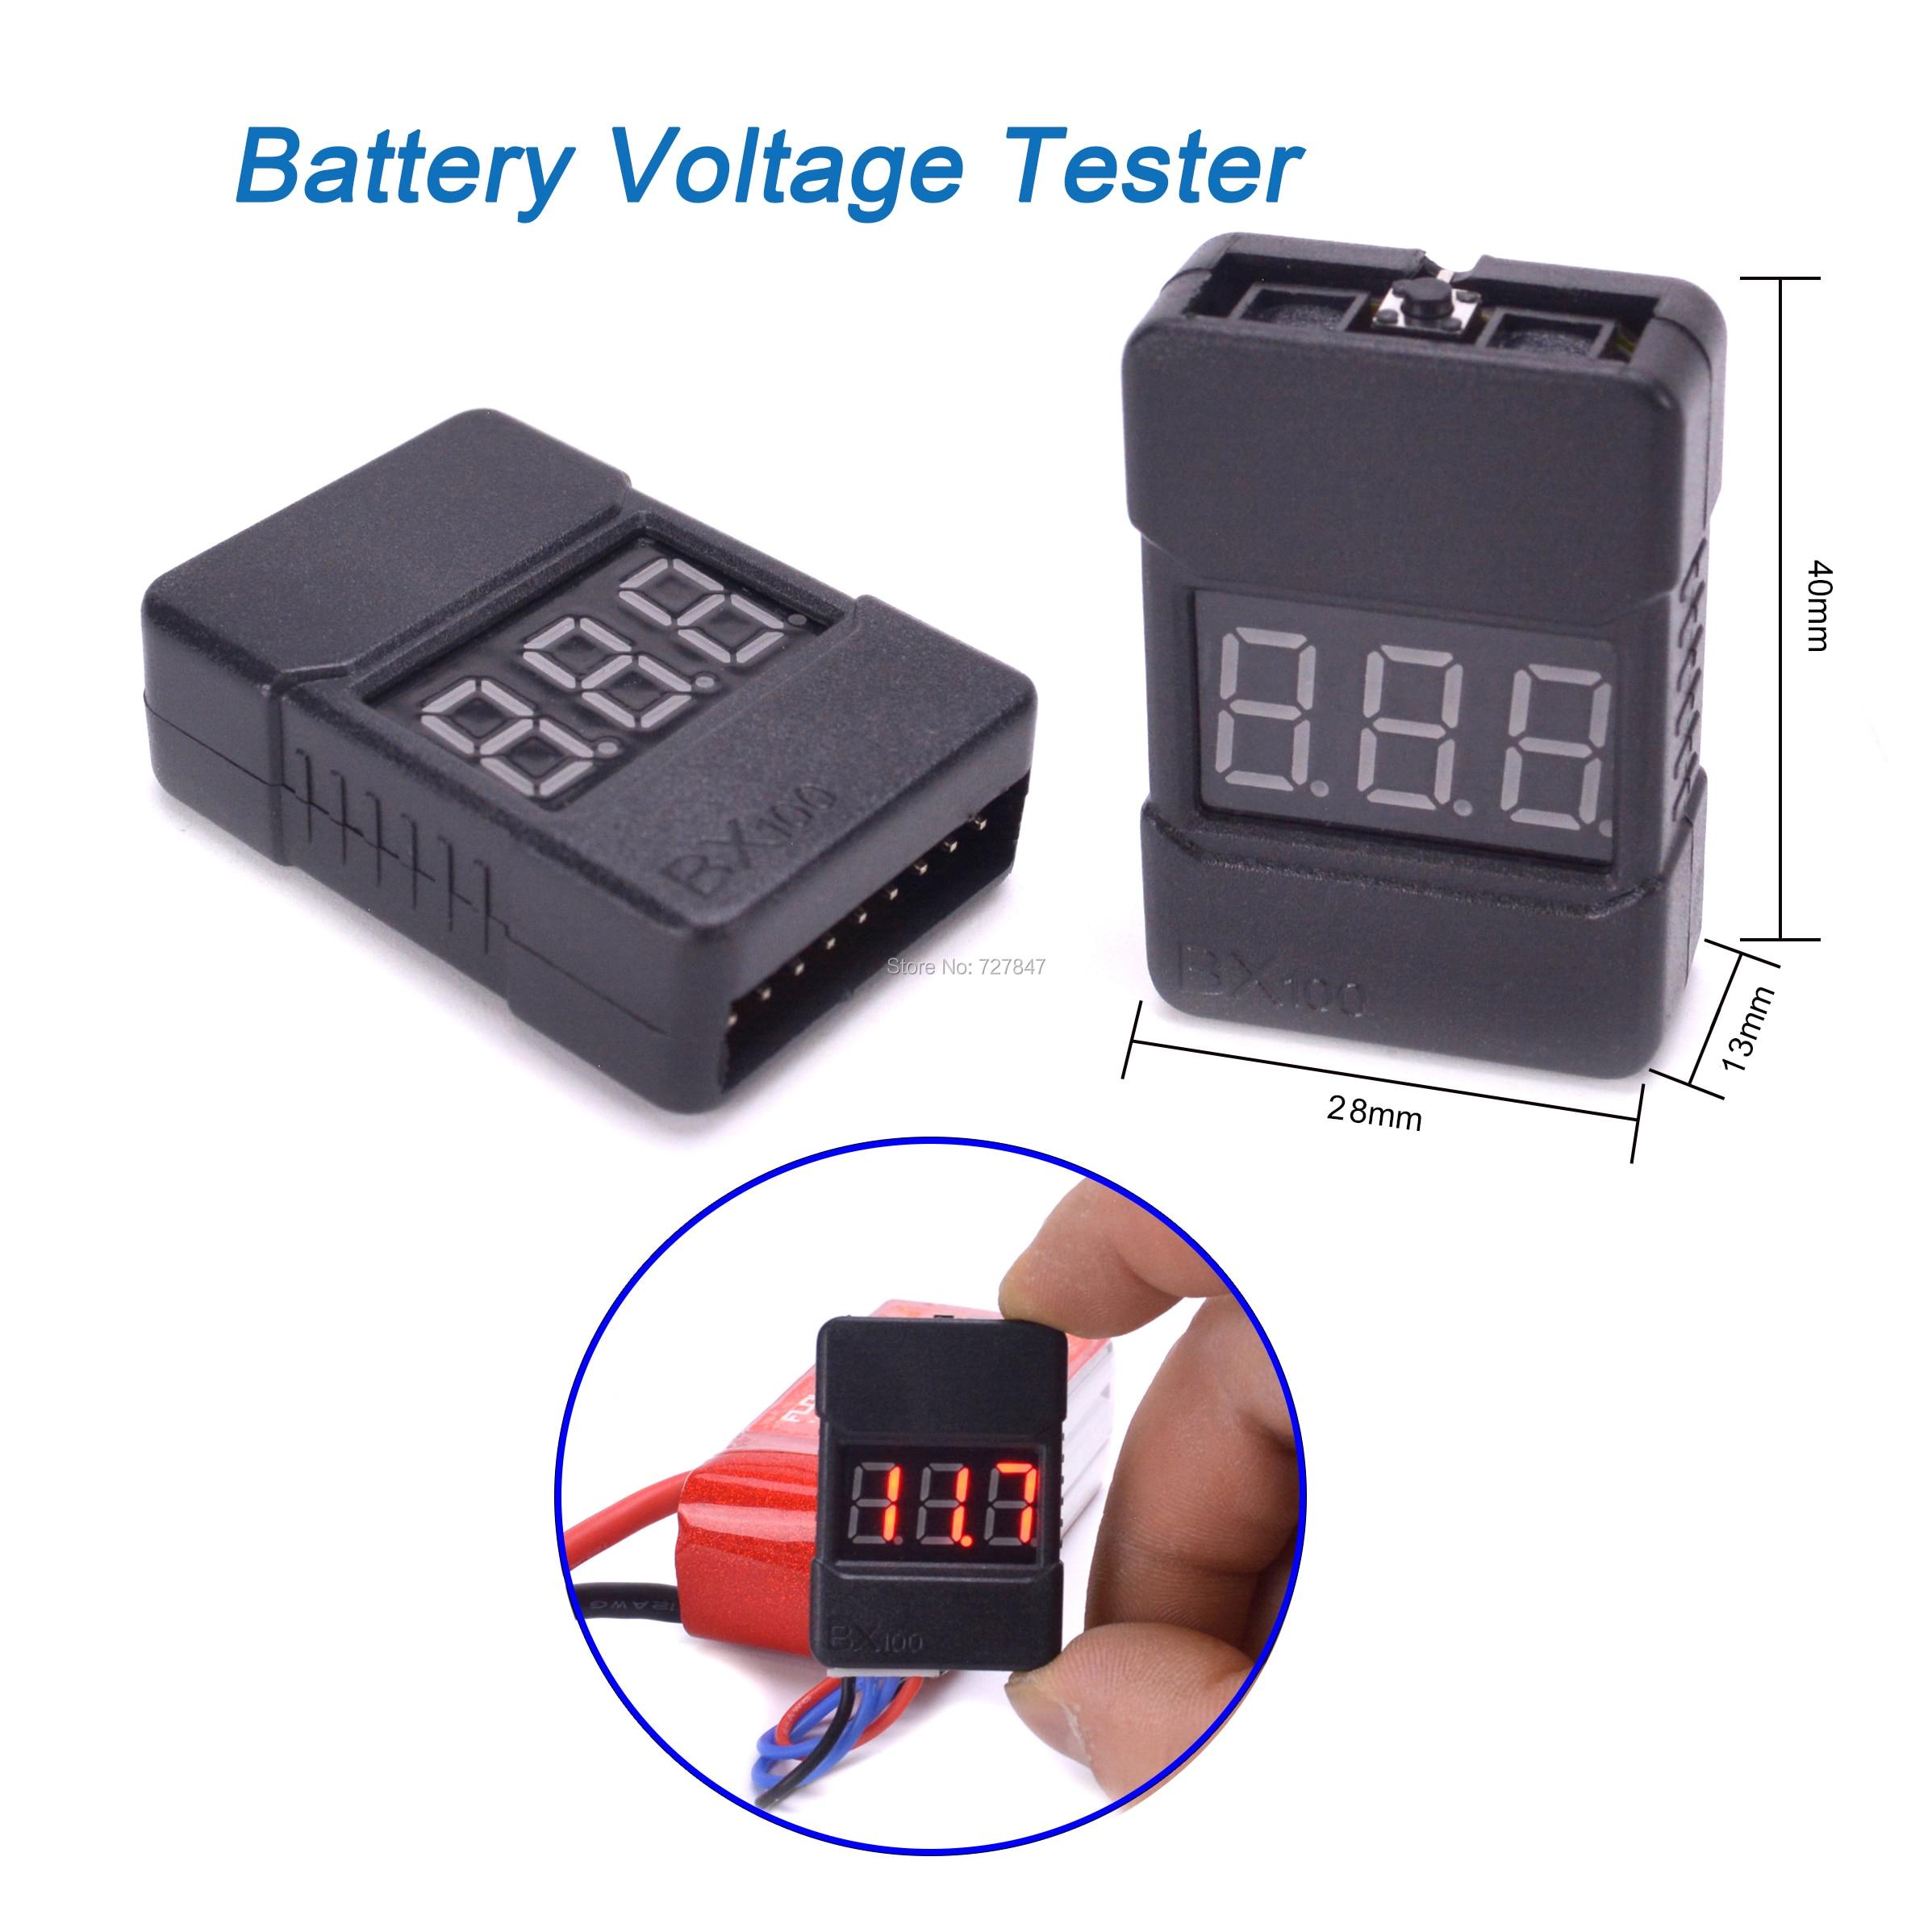 BX100 3.7-30V 1-8S LiPo Li-po/ion/Fe Battery Voltage Tester Low Voltage Buzzer Alarm